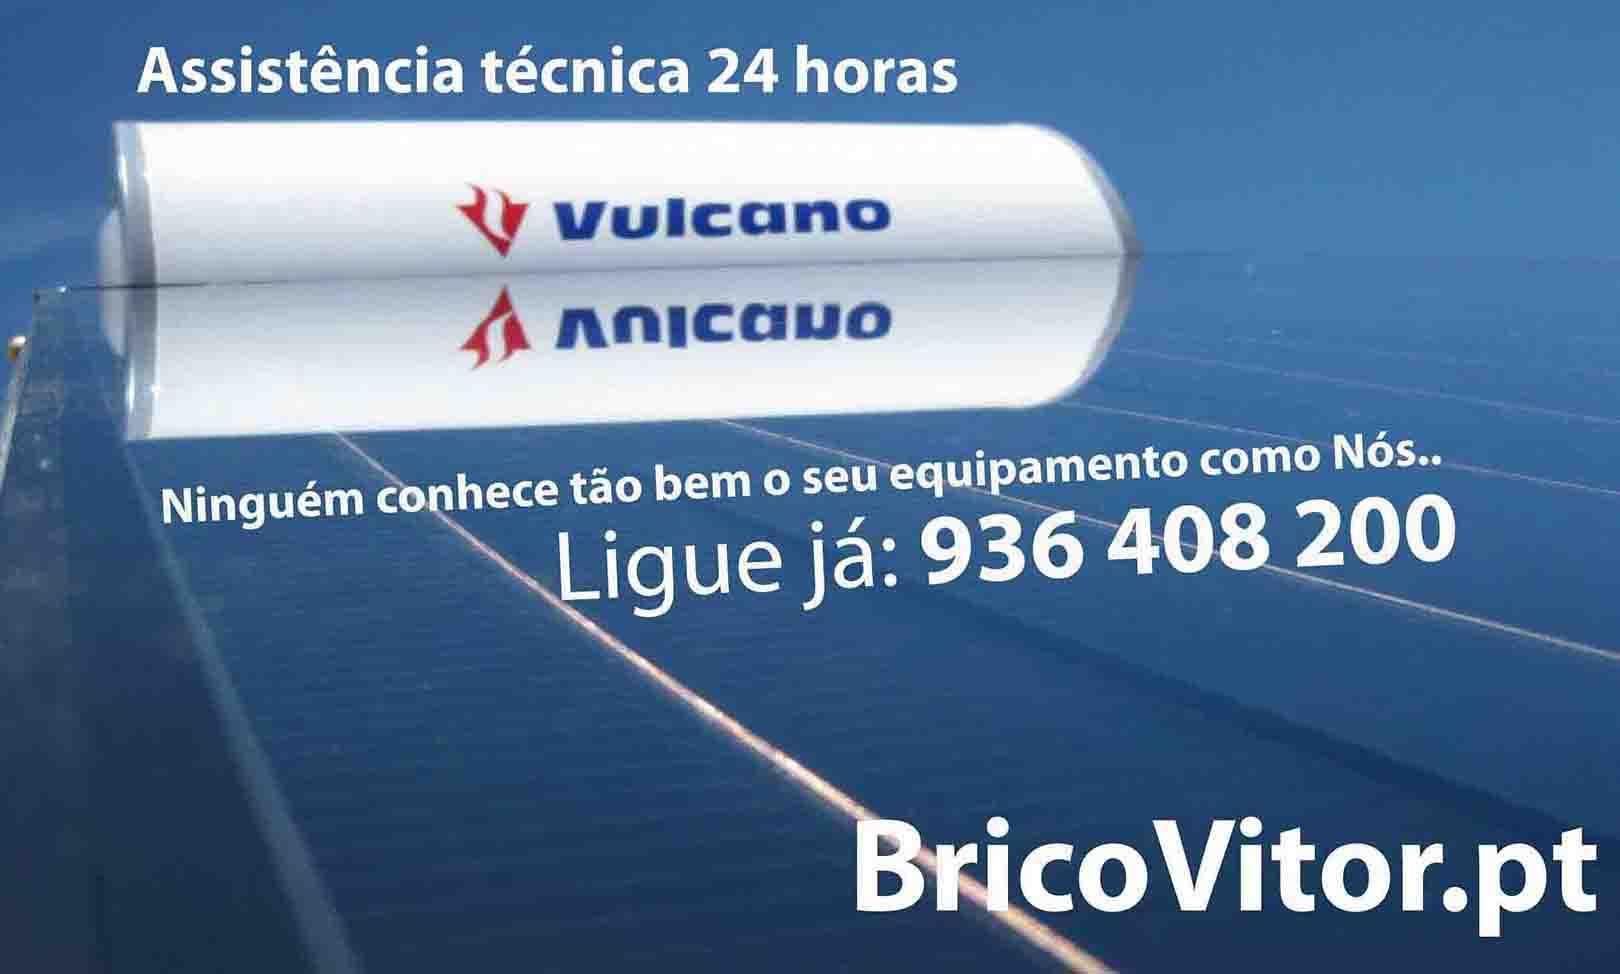 BricoVitor - Assistência painéis Solares